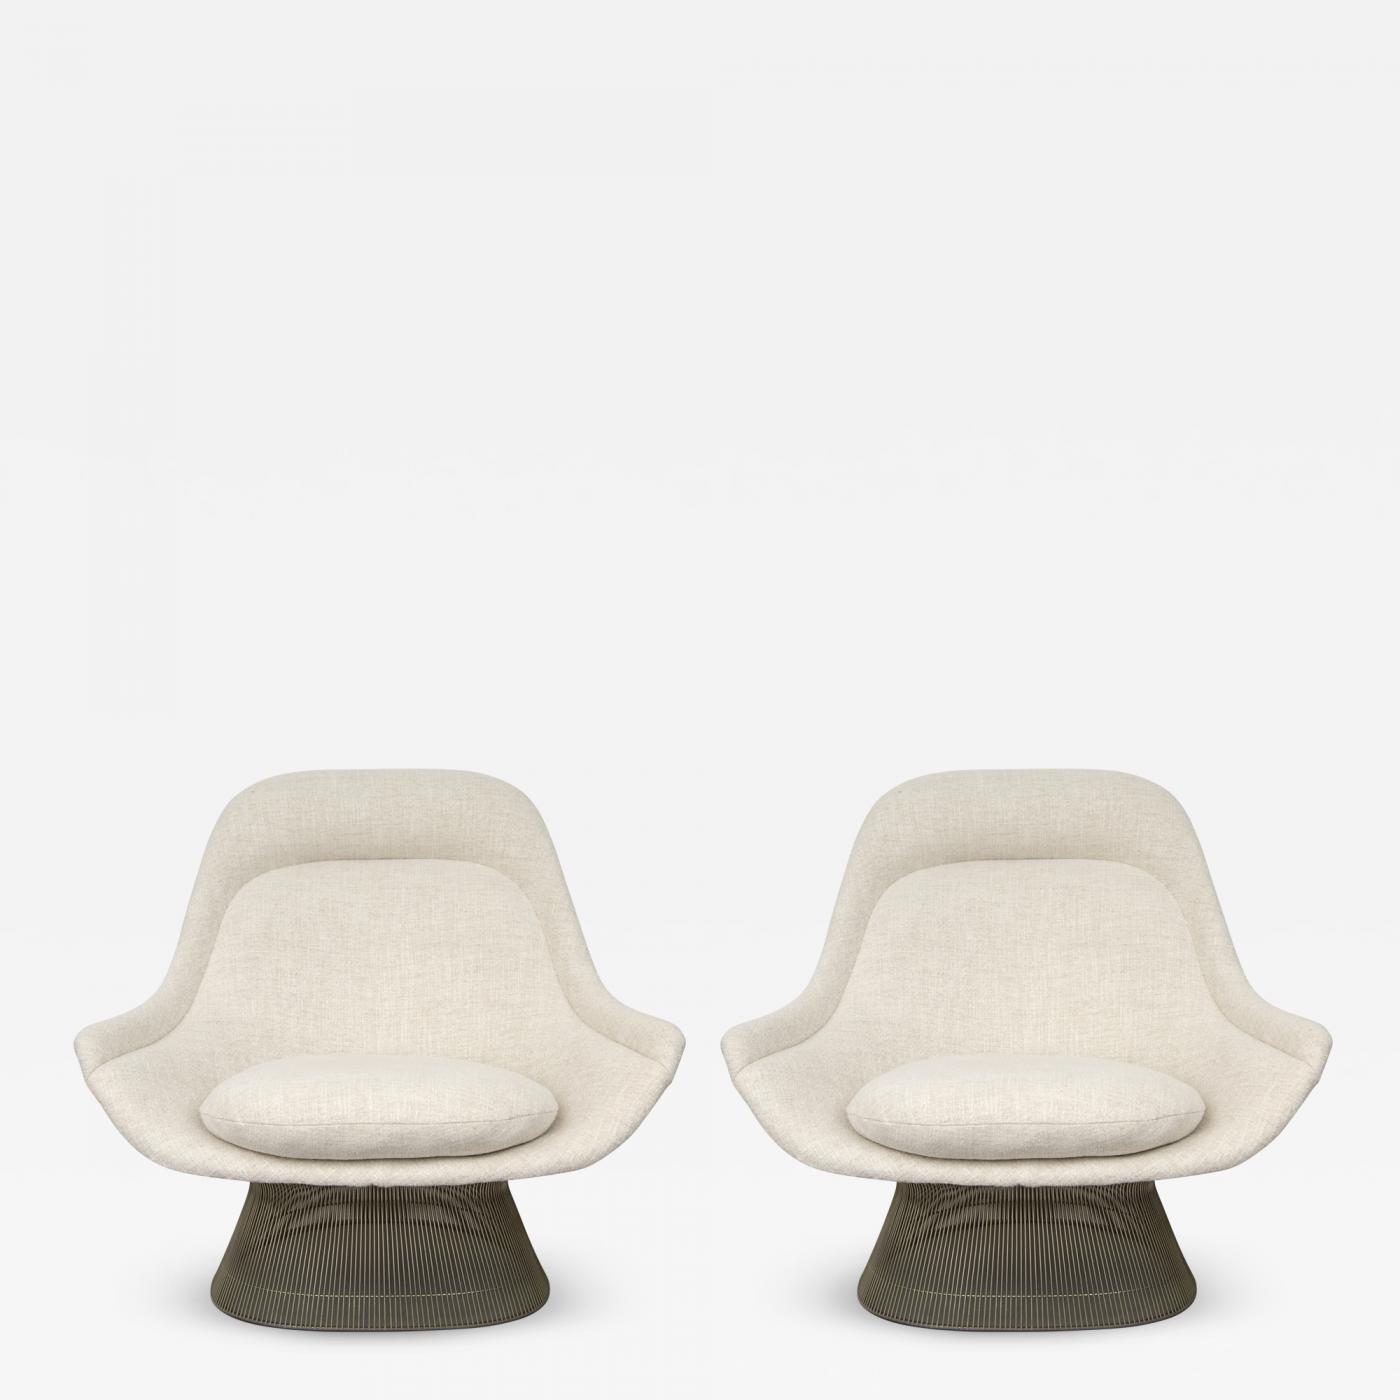 platner furniture. Warren Platner Furniture. Listings / Furniture Seating Lounge Chairs · W